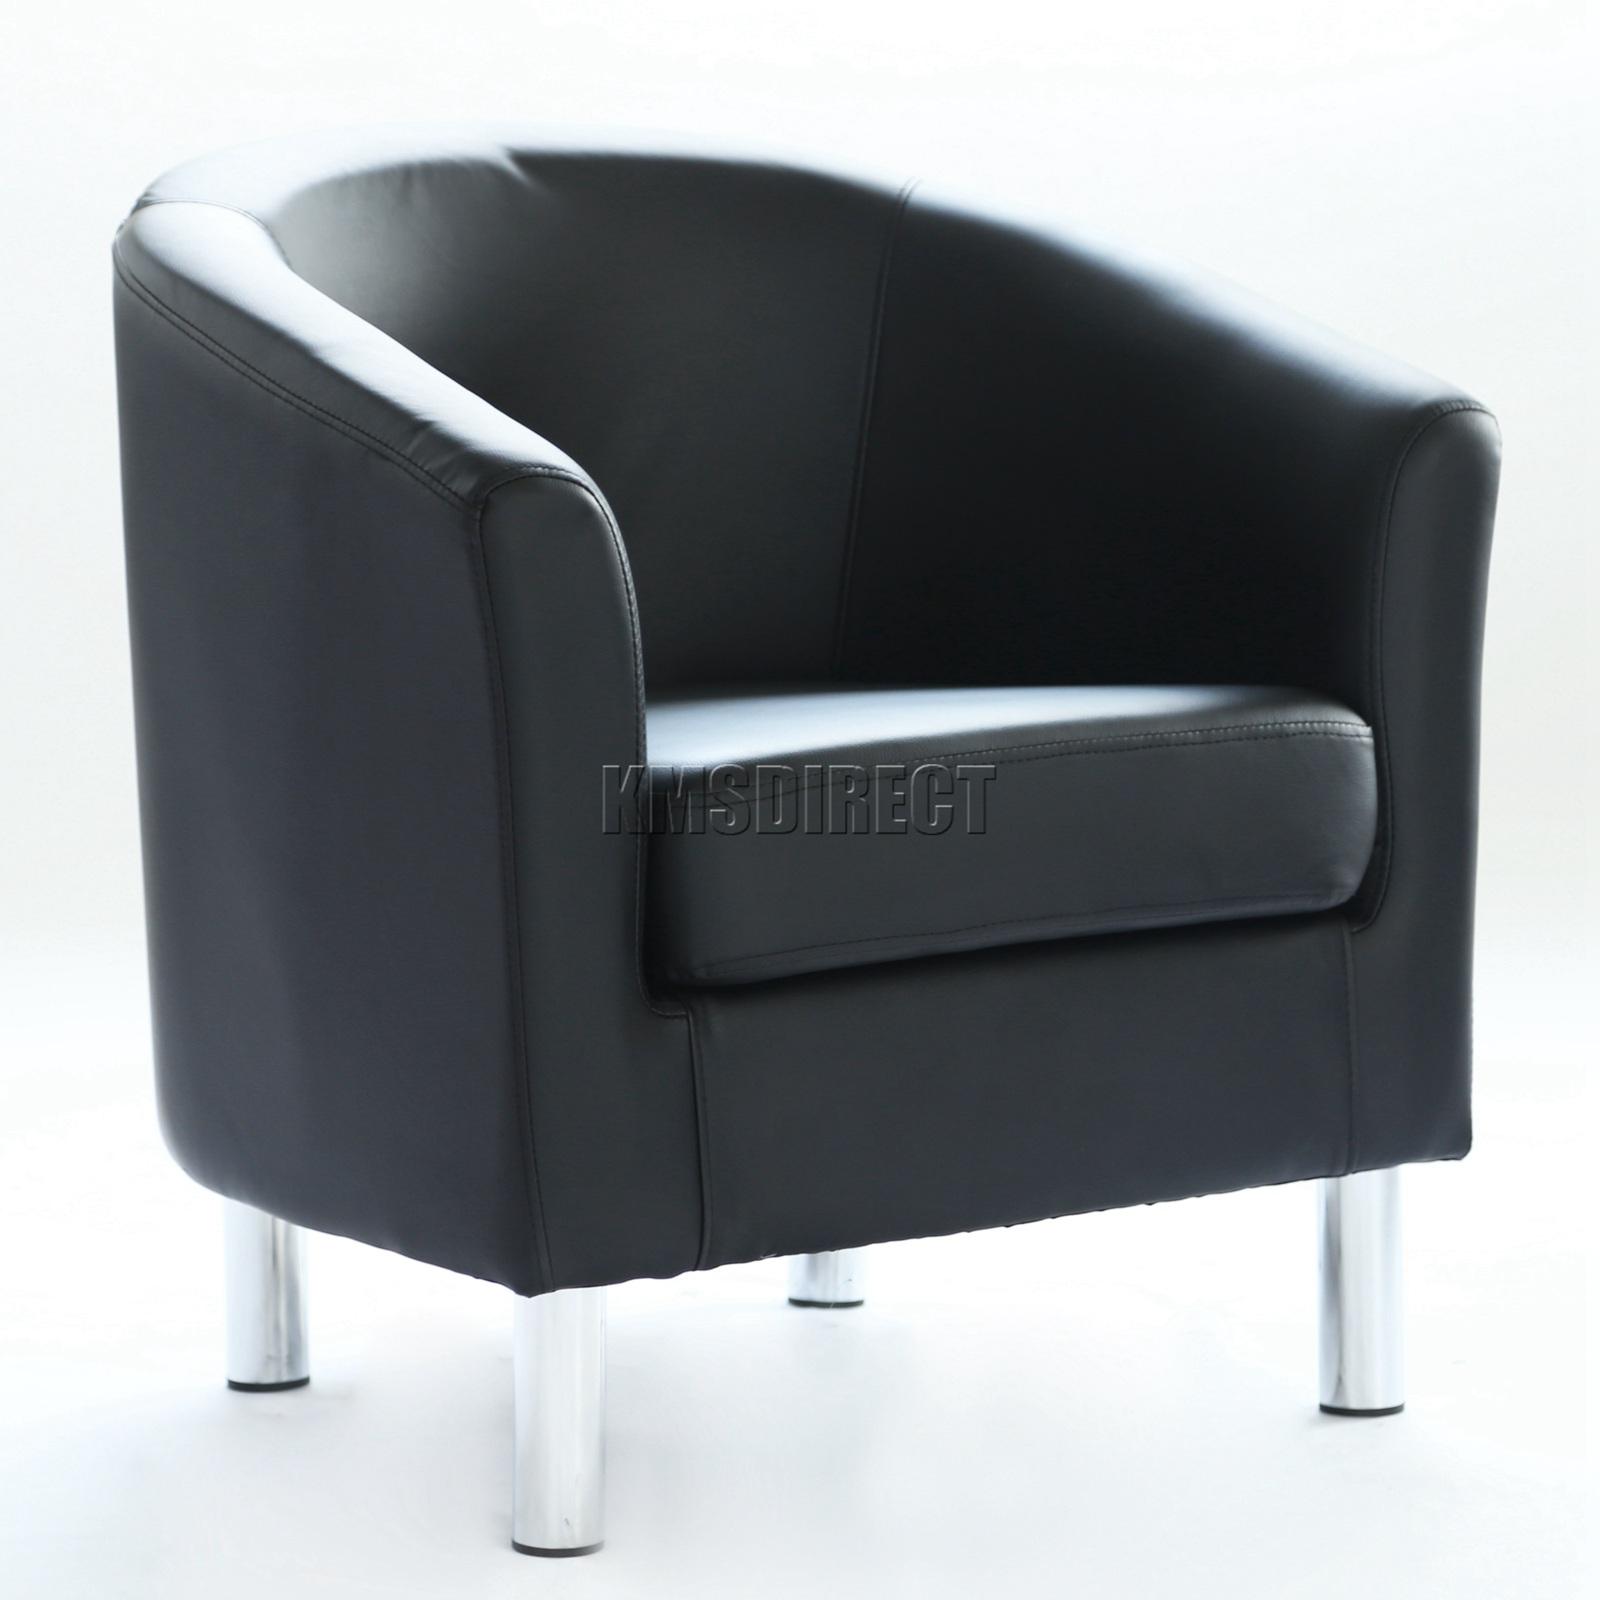 WestWood Modern Tub Chair Armchair PU Faux Leather With Chrome Leg ...